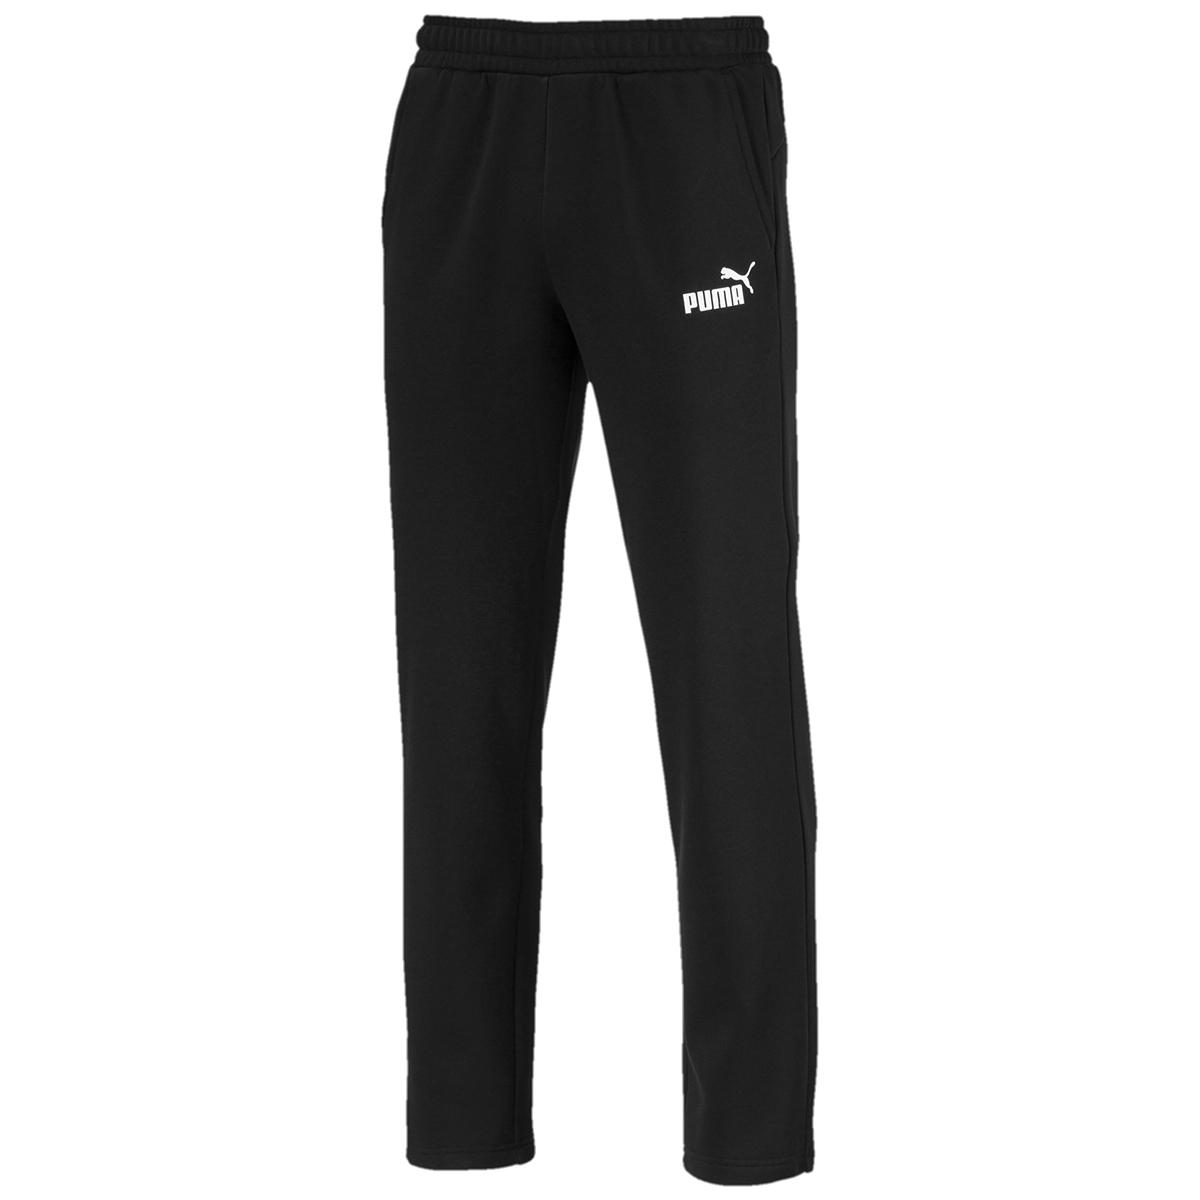 Puma Men's Essential Logo Pants - Black, XXL